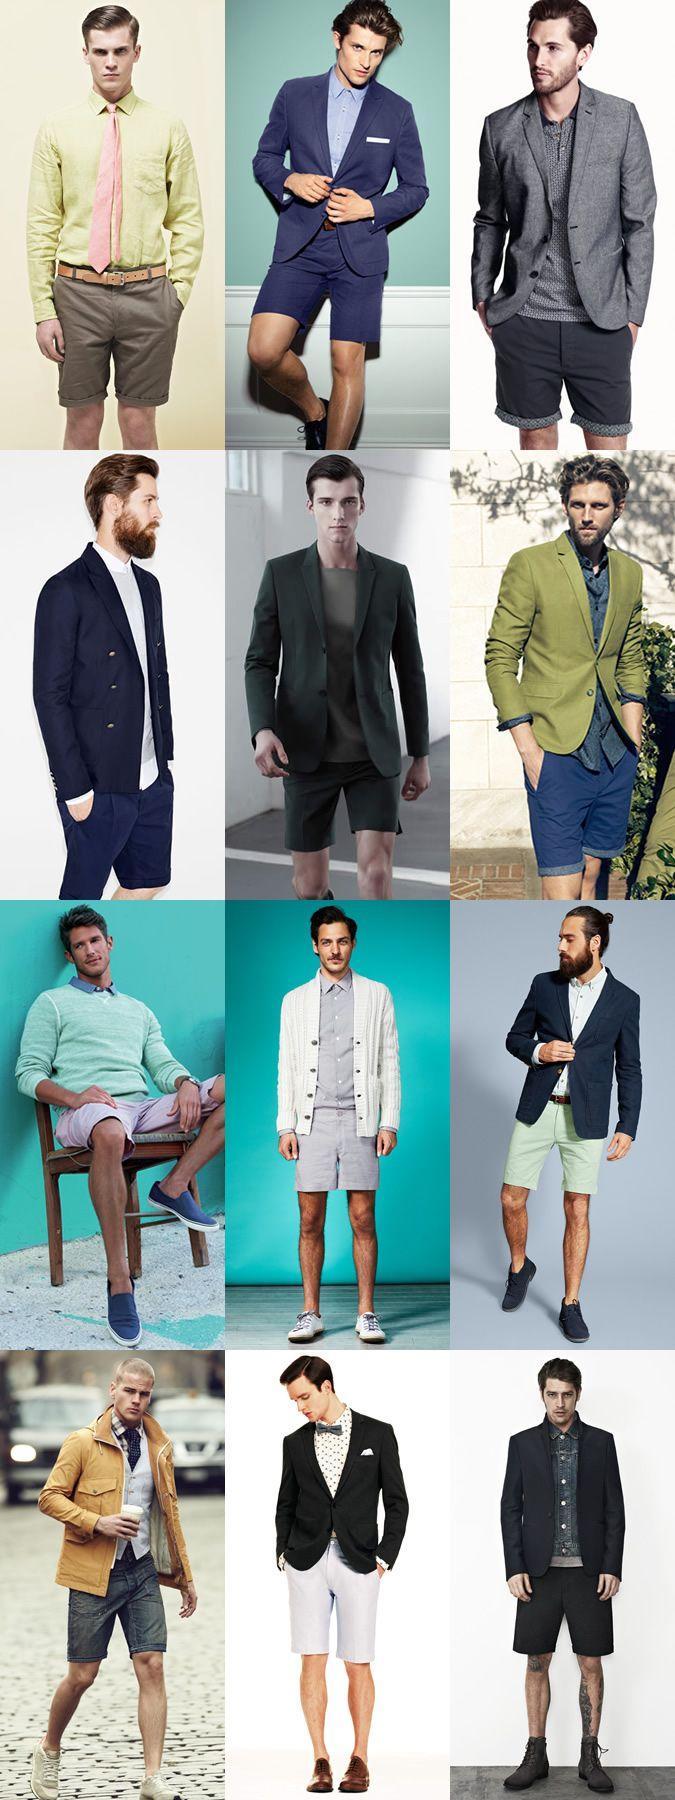 Smart casual men dress code summer casual